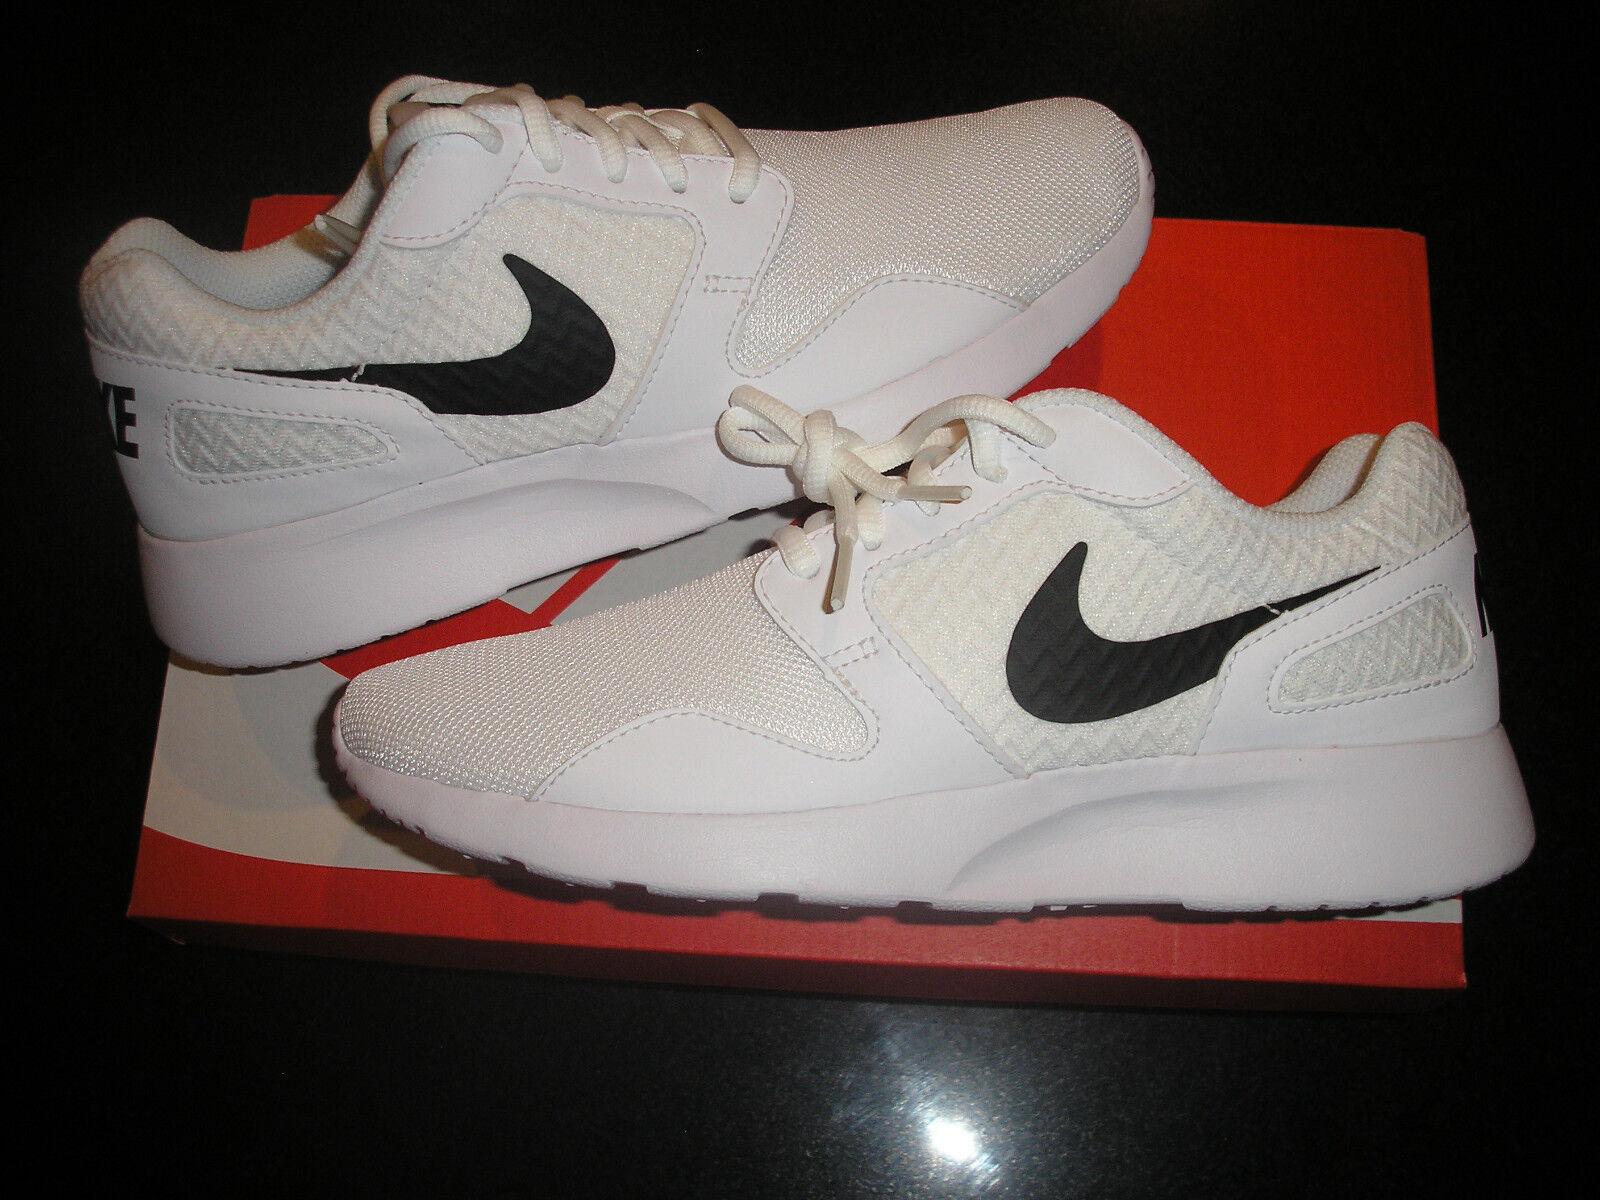 finest selection d1eff e5f6a Femme Nike Kaishi Kaishi Kaishi Running Gym Chaussure NEW BOX MODEL 654845  103 842f34